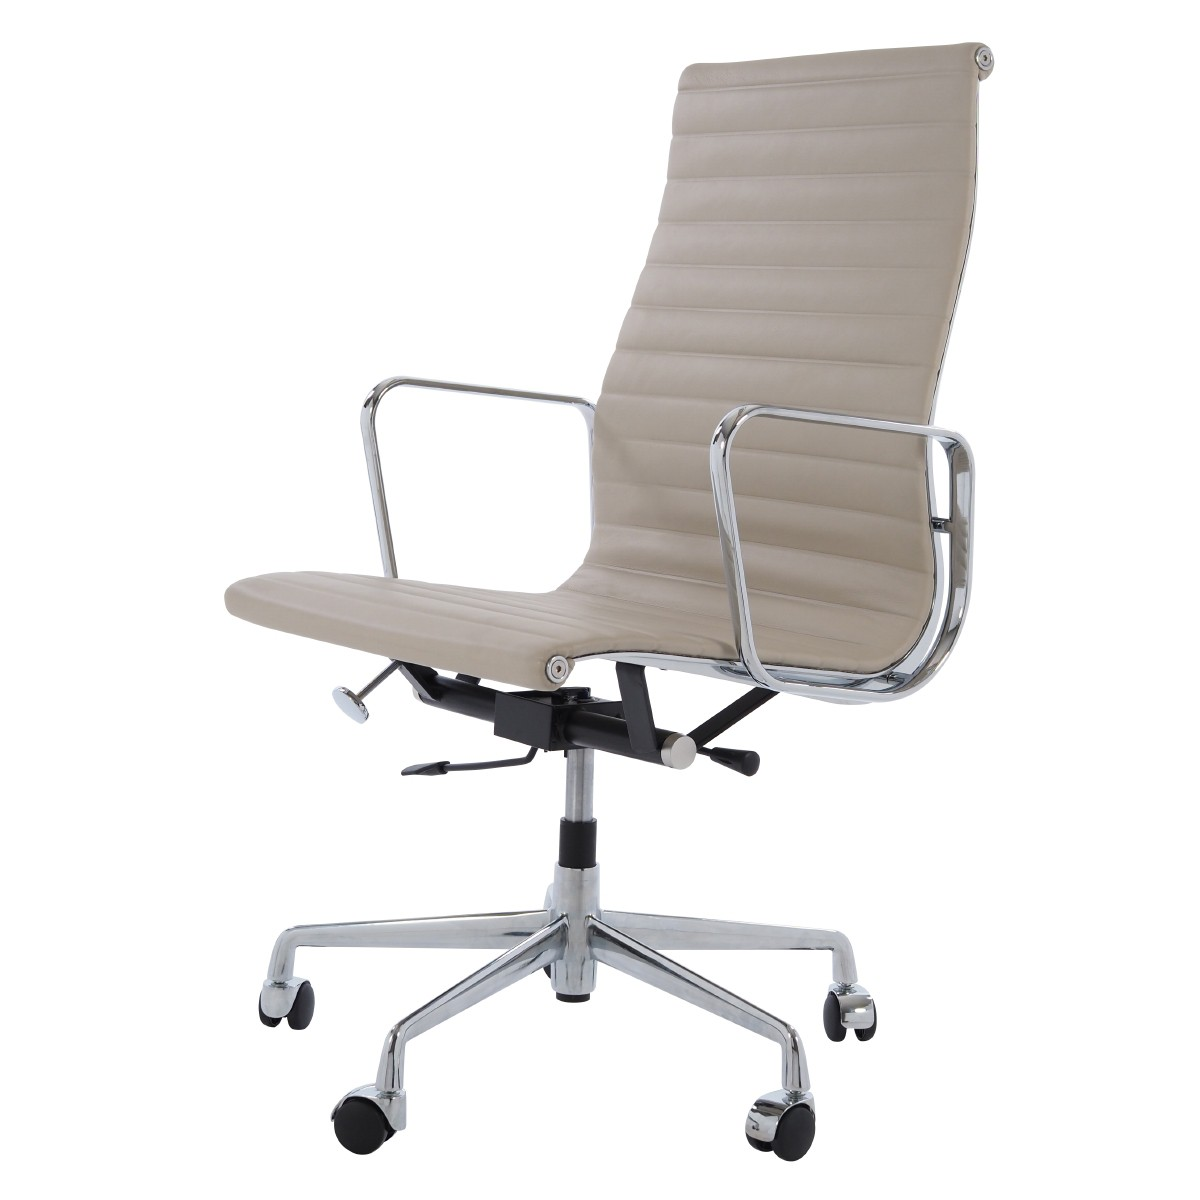 Charles Eames Bureaustoel.Charles Eames Bureaustoel Ea119 Wit